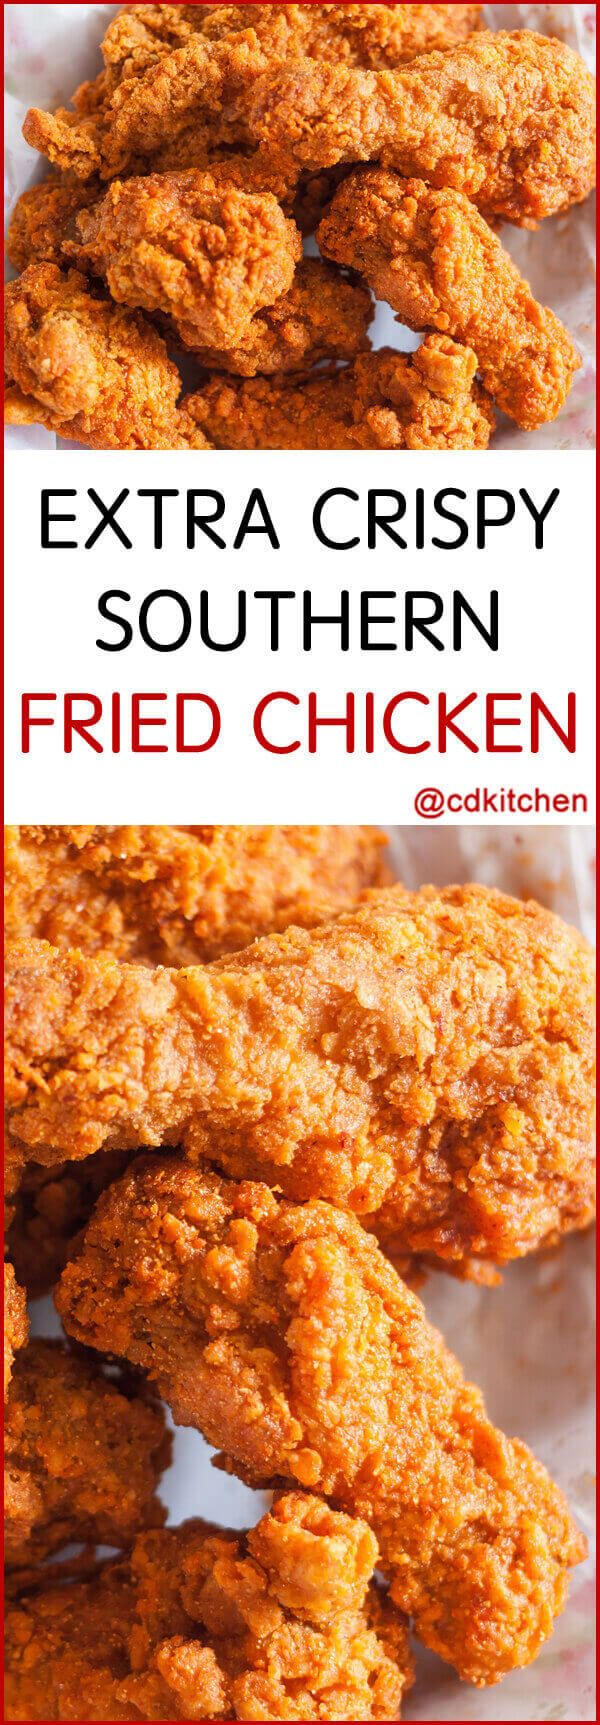 Extra Crispy Southern Fried Chicken Recipe | CDKitchen.com